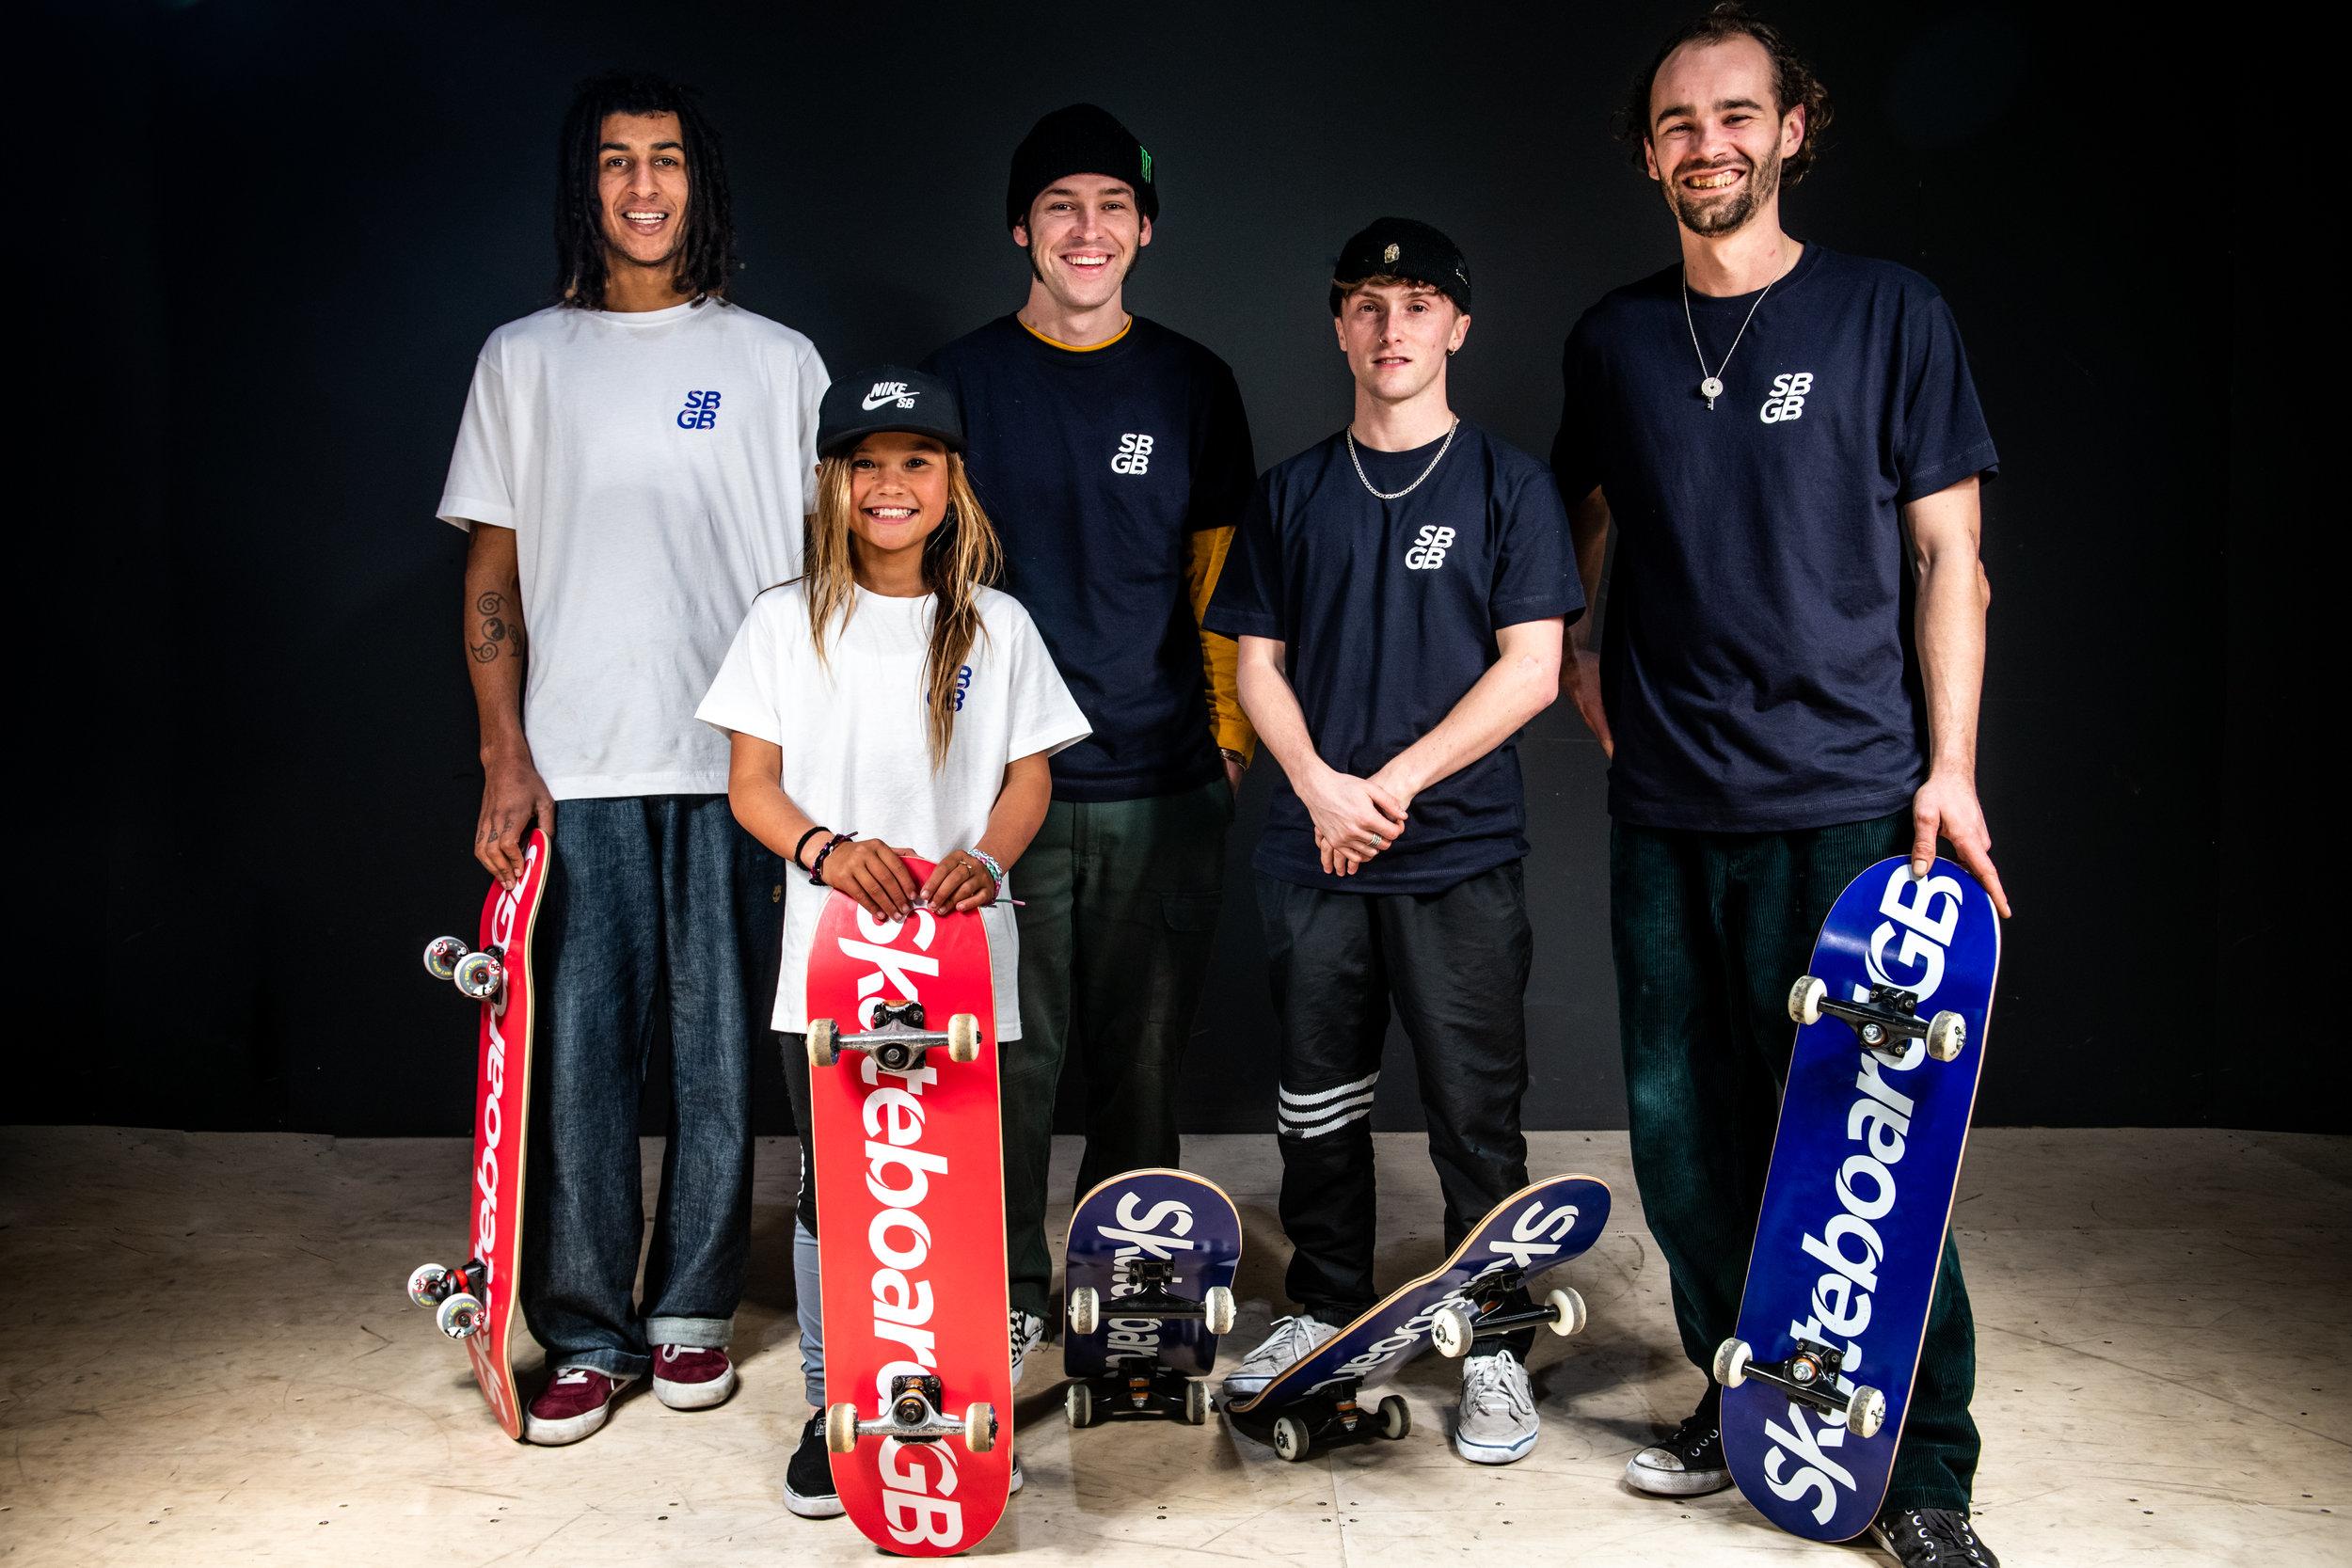 2019 Skateboard GB Team. Photo: Garry Jones